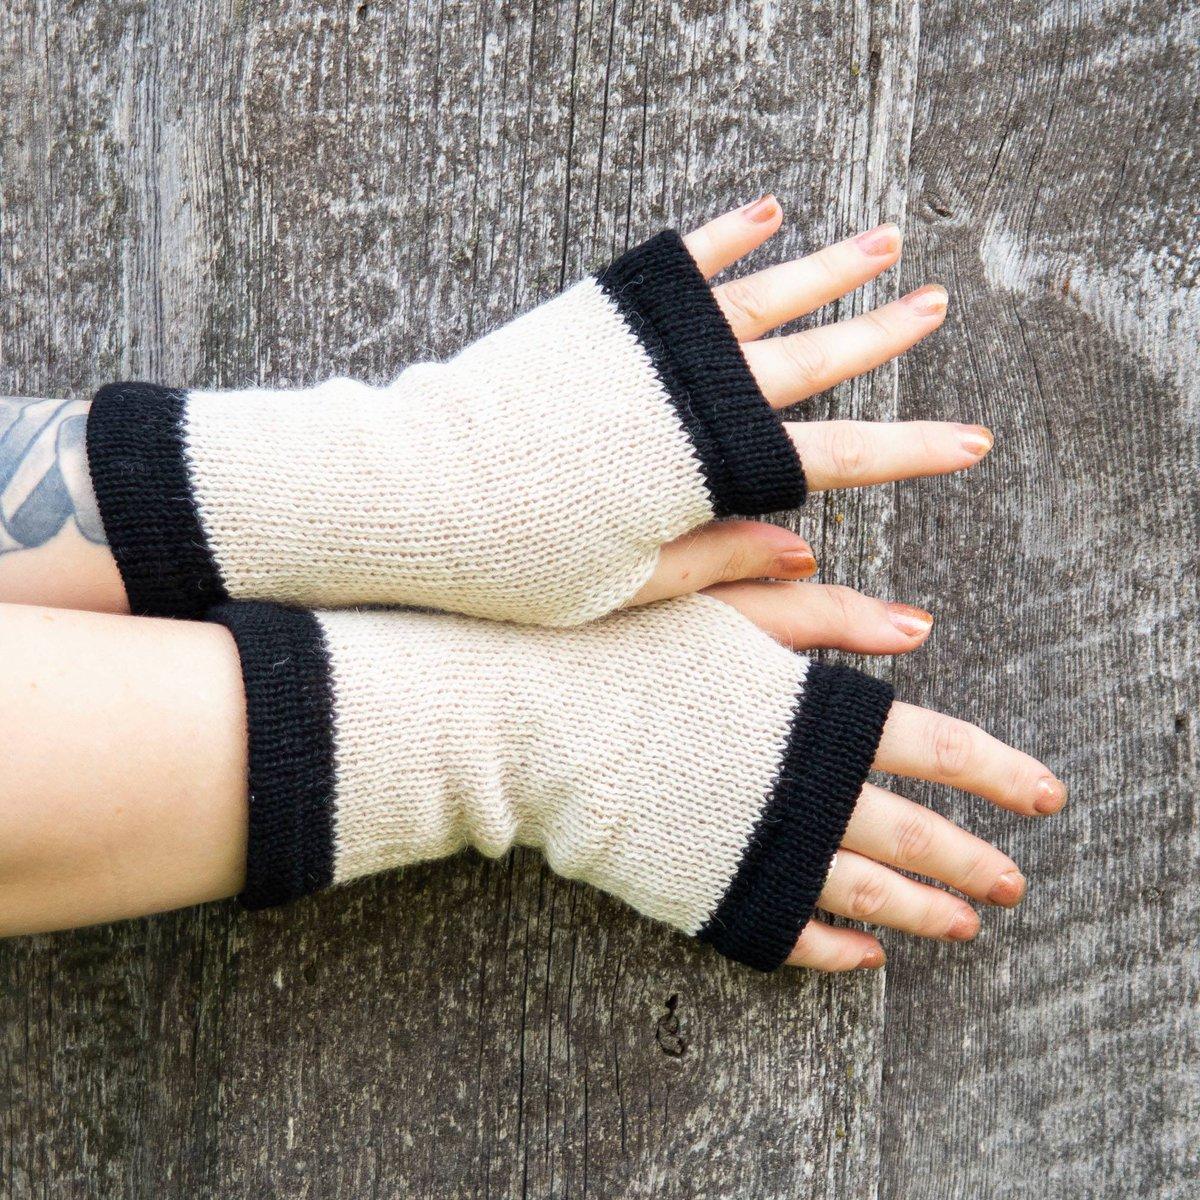 #Sale! 20% OFF! #Fingerless #knit #Gloves #soft #wool  #mittens #Wrist #warmers #merino #alpaca wool #beige #black #handmade #mitts #GiftForHer  @Etsy